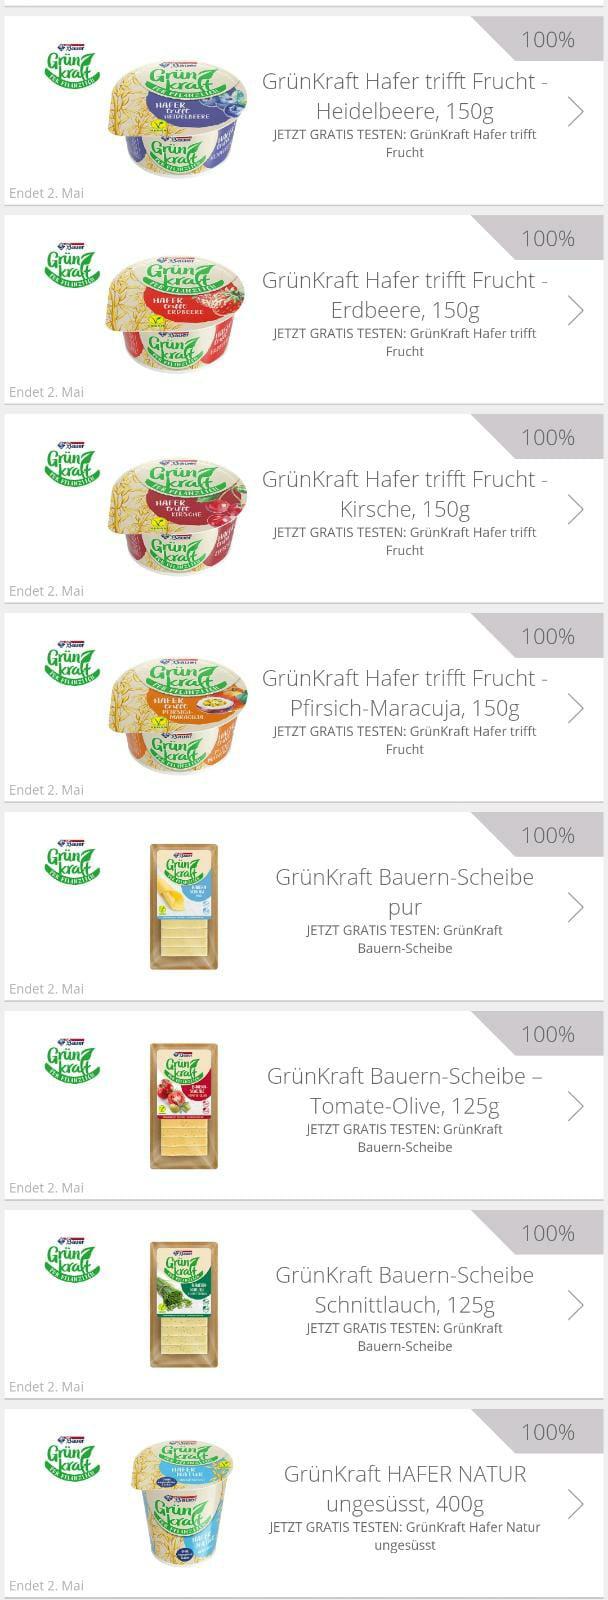 [GzG, Scondoo] GrünKraft - Vegane Produkte gratis testen